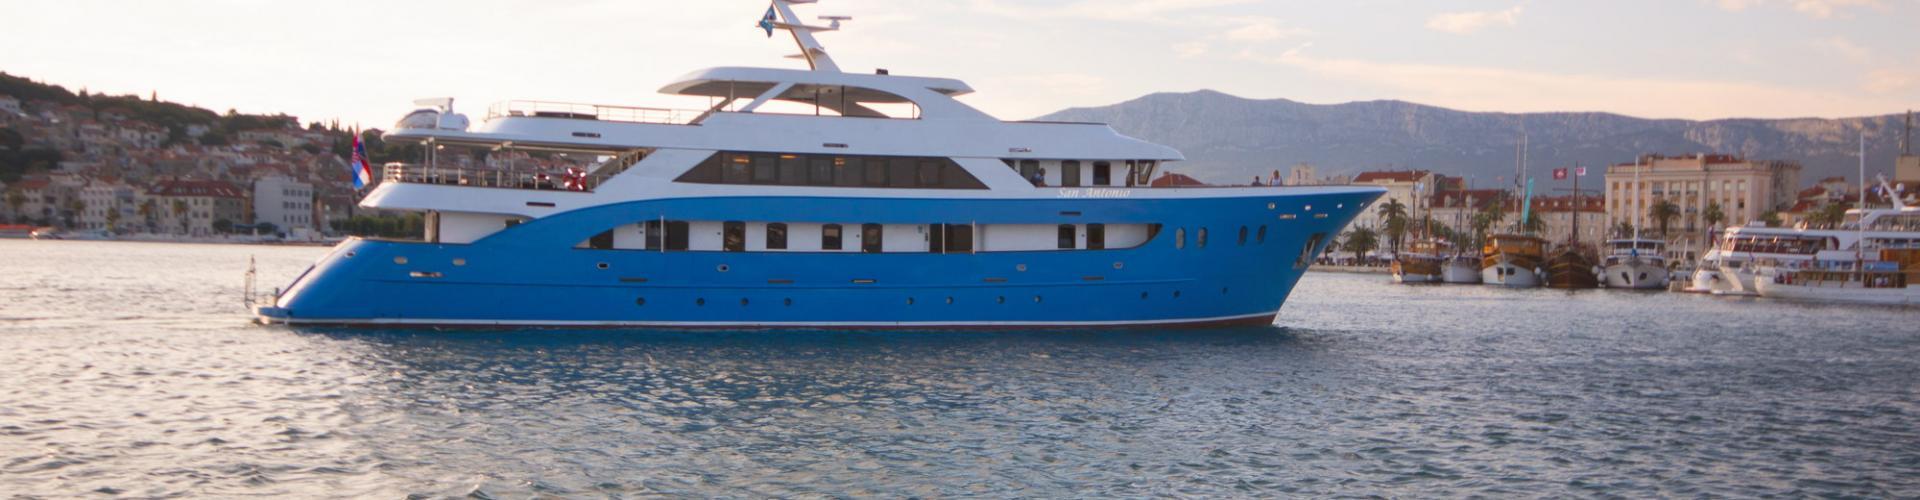 motor boat Deluxe cruiser MV San Antonio